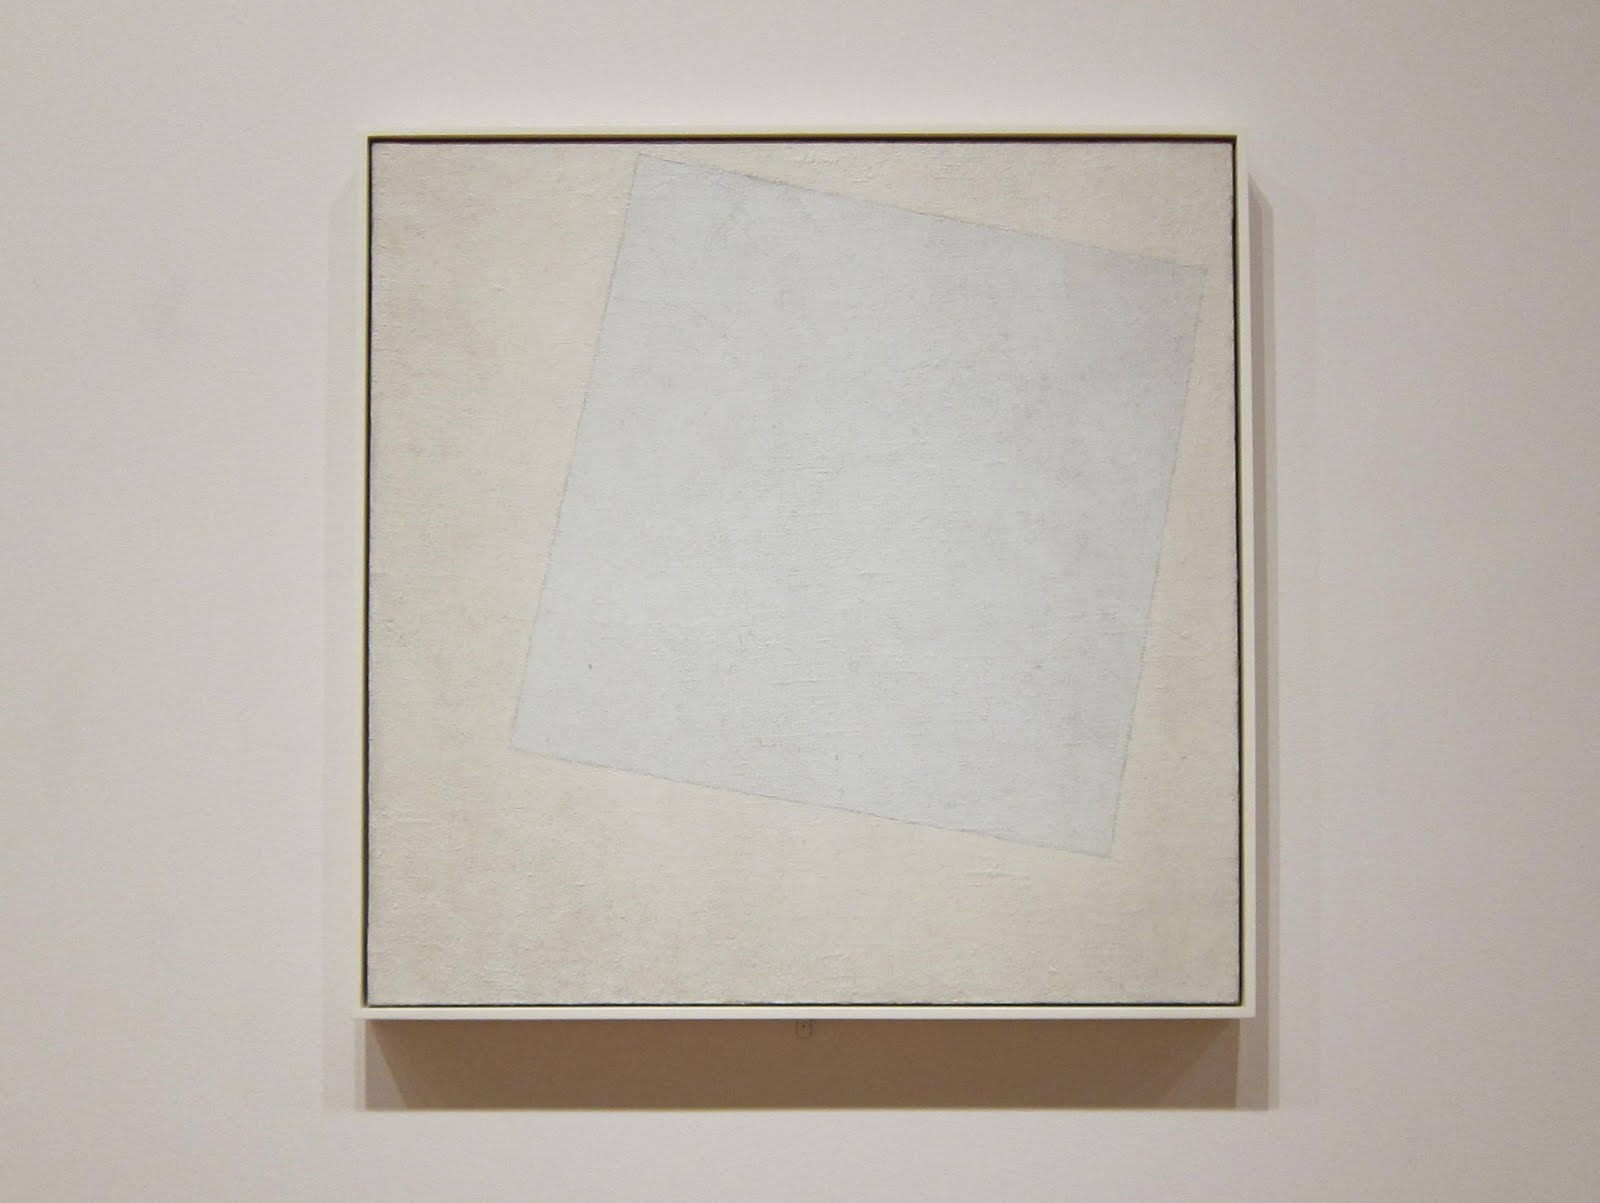 Kasimir Malevich (1879-1935), Suprematist Composition: White on White, 1918.